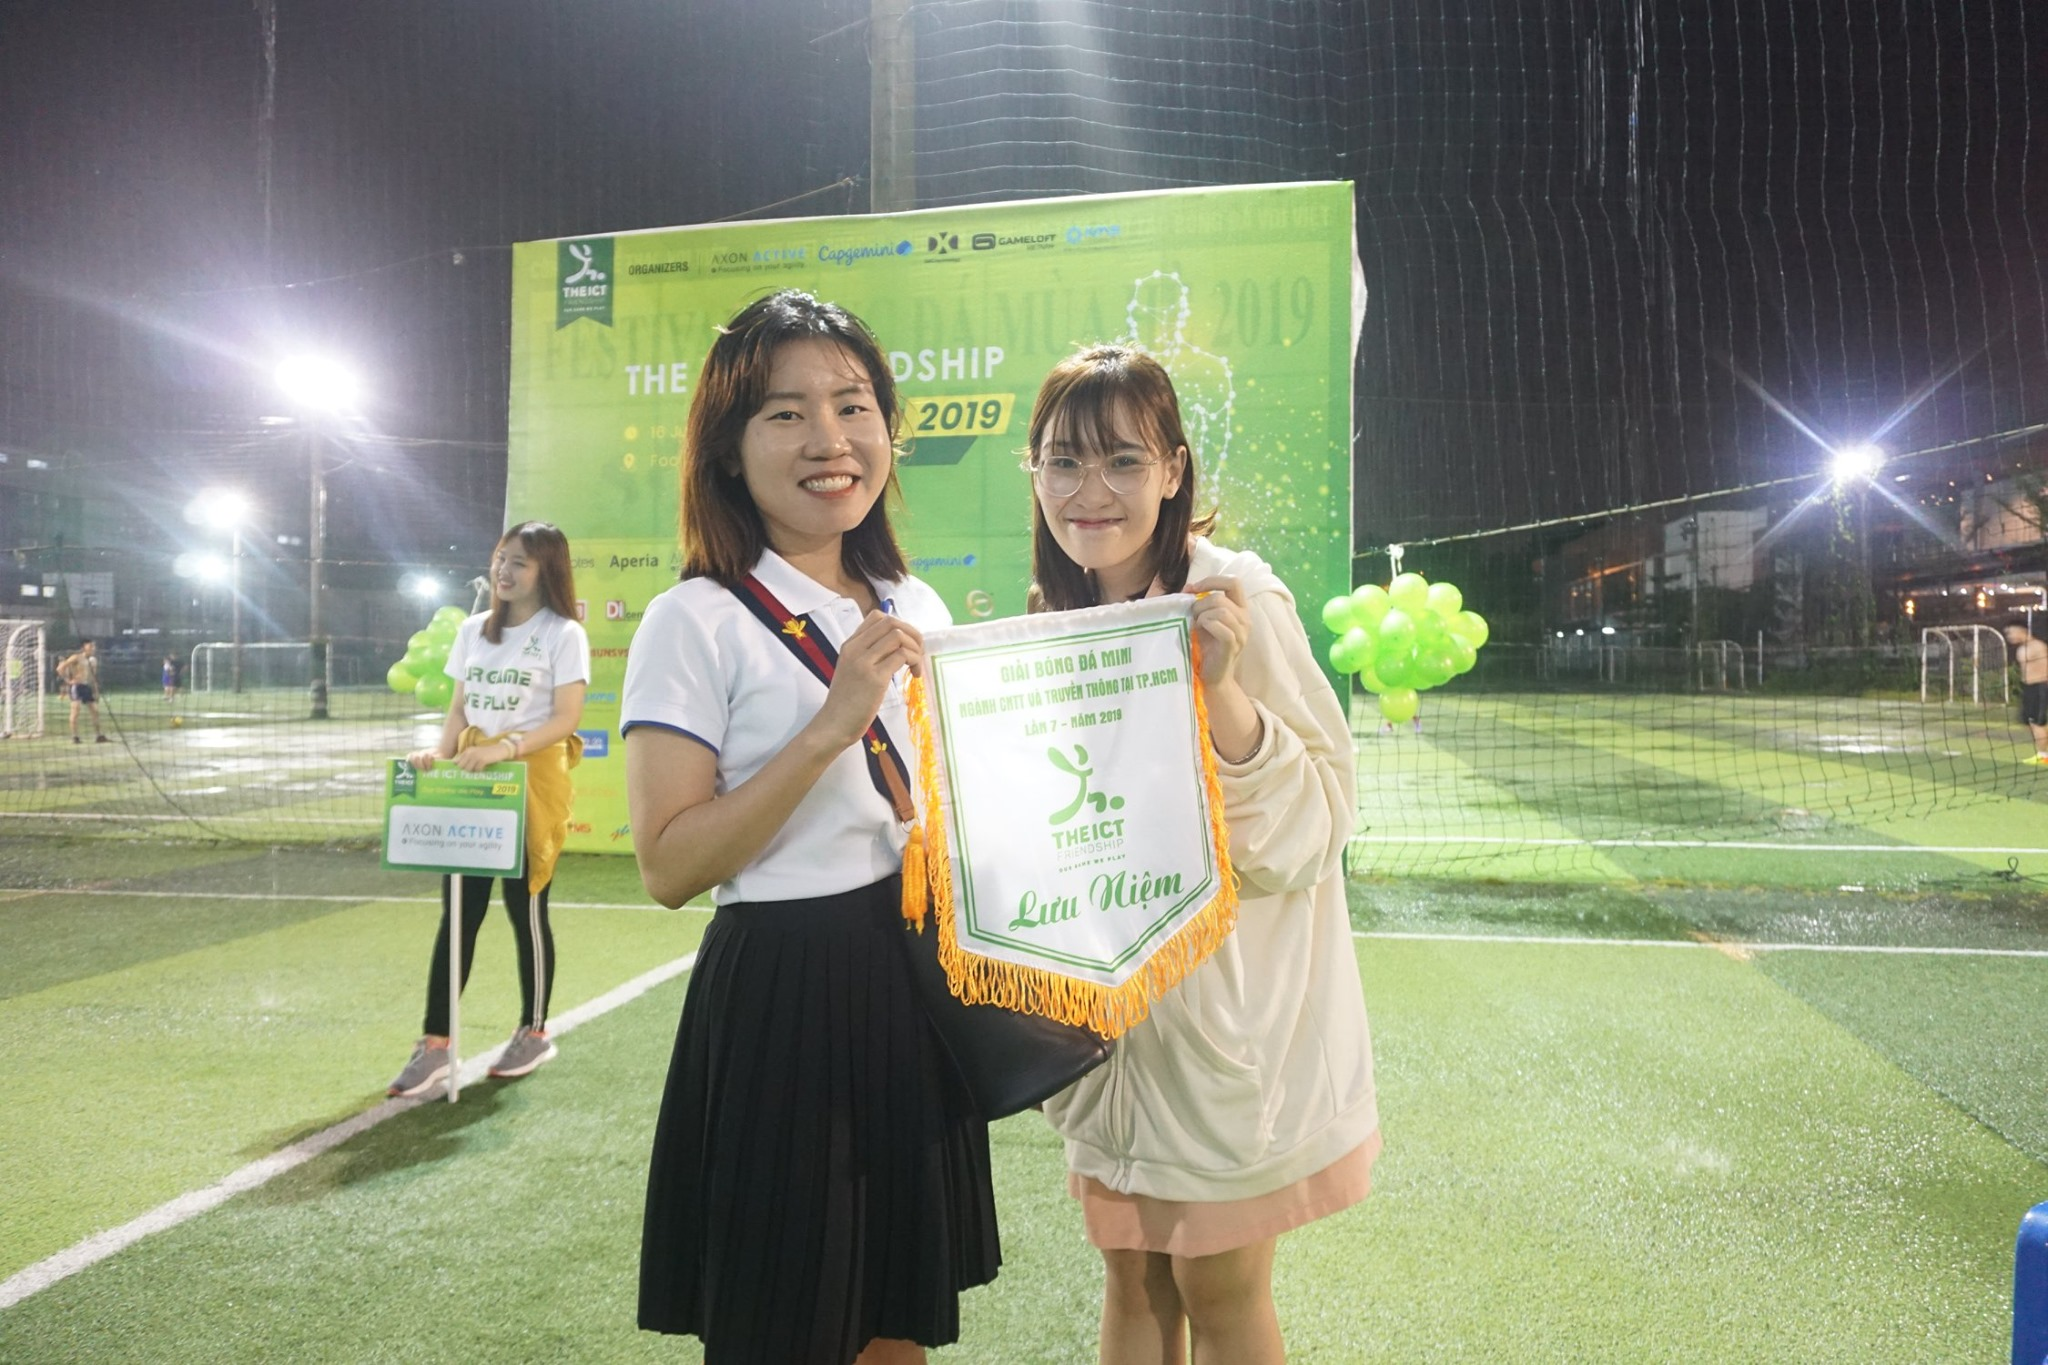 rakumo tham dự cúp ICT Friendship 2019